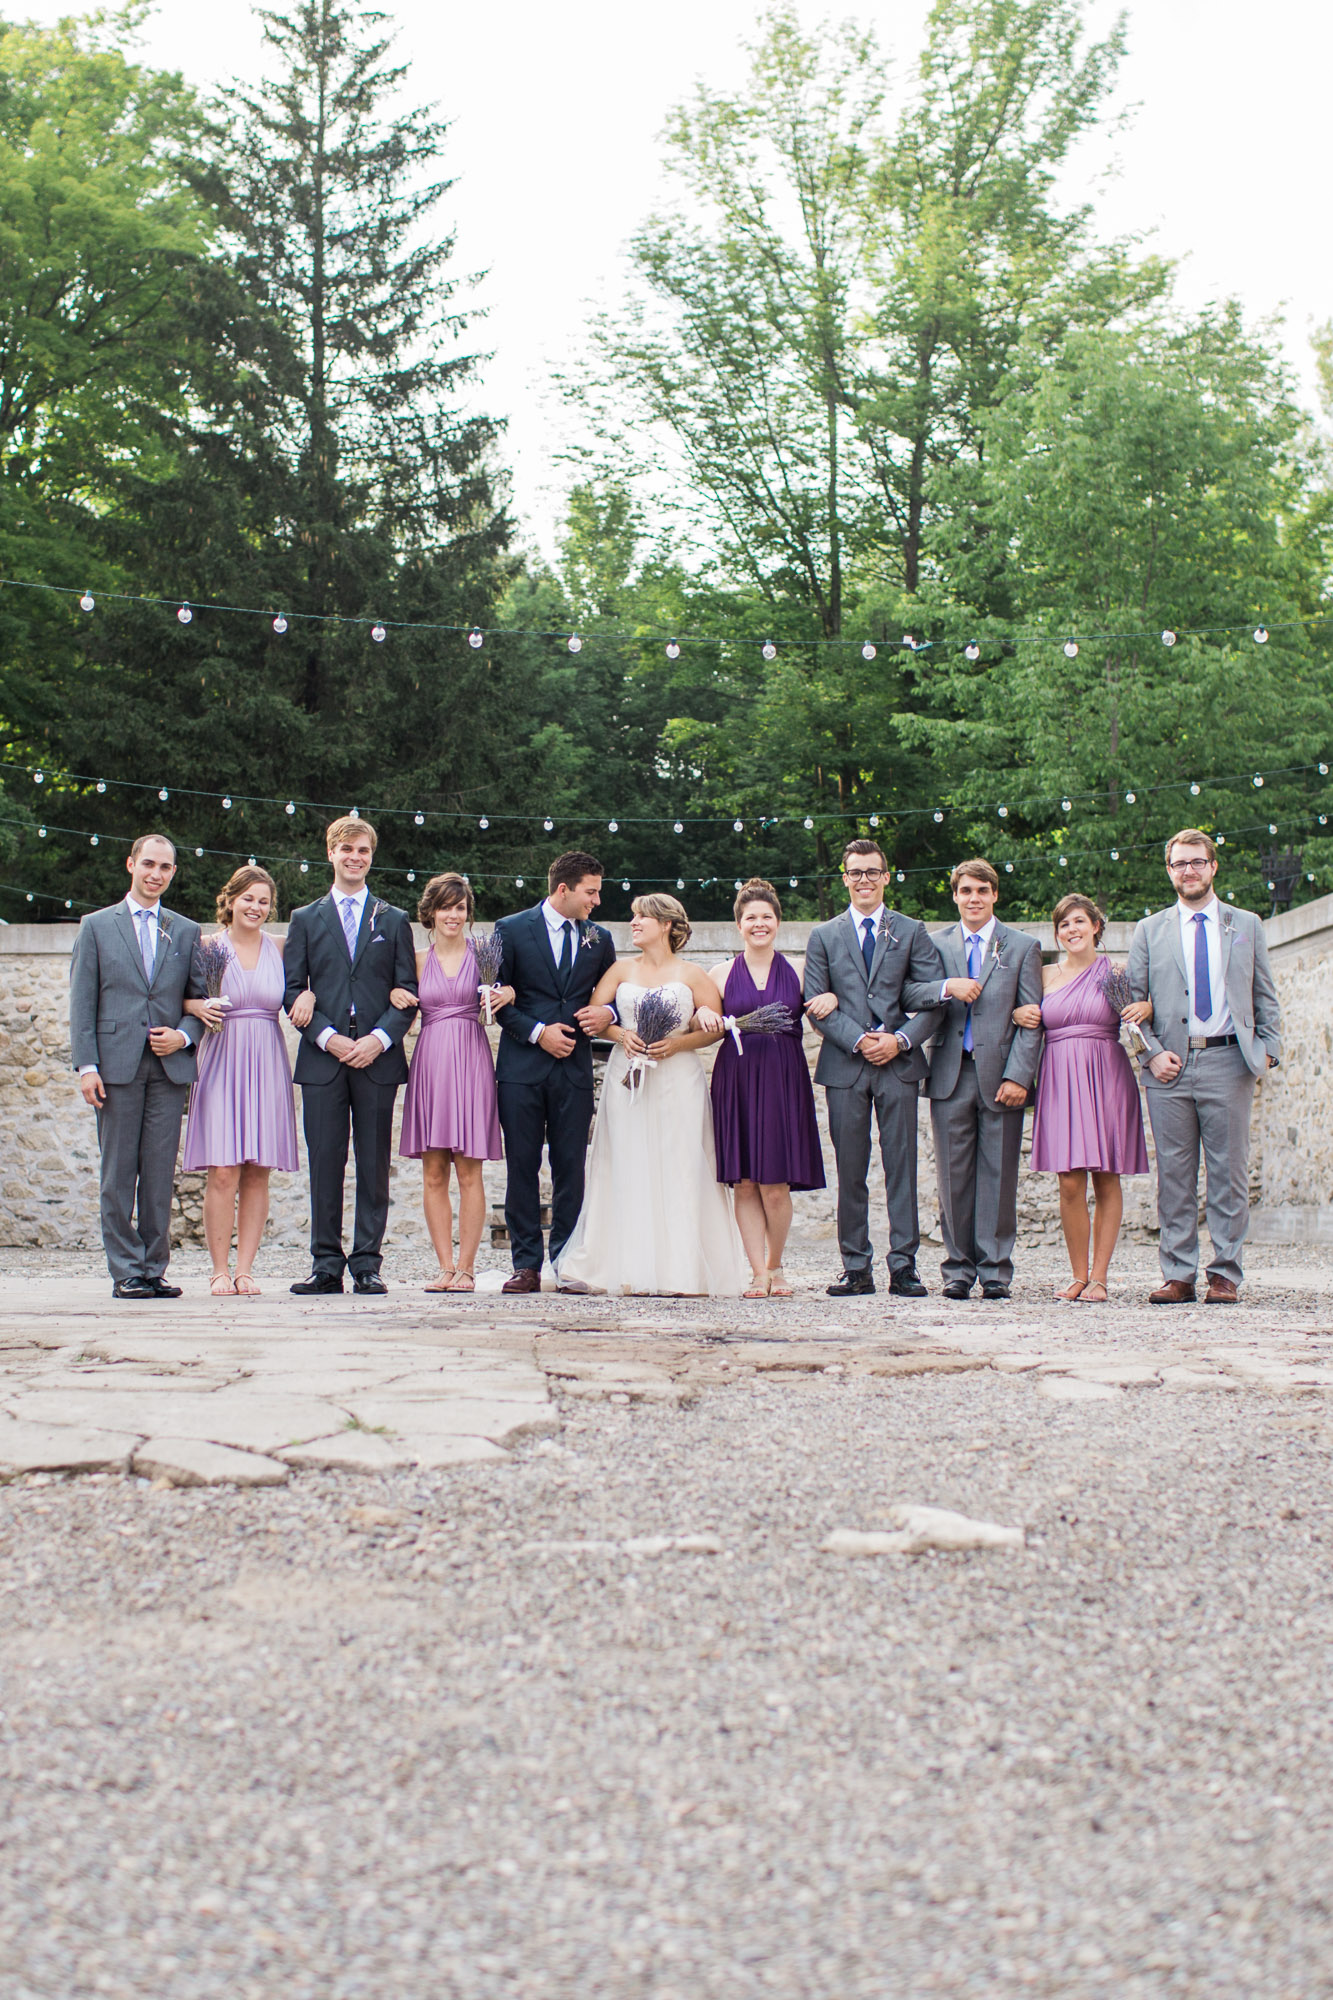 Alton Mill Wedding - Caledon Wedding Photography - Love BEE Photography (326 of 630).jpg